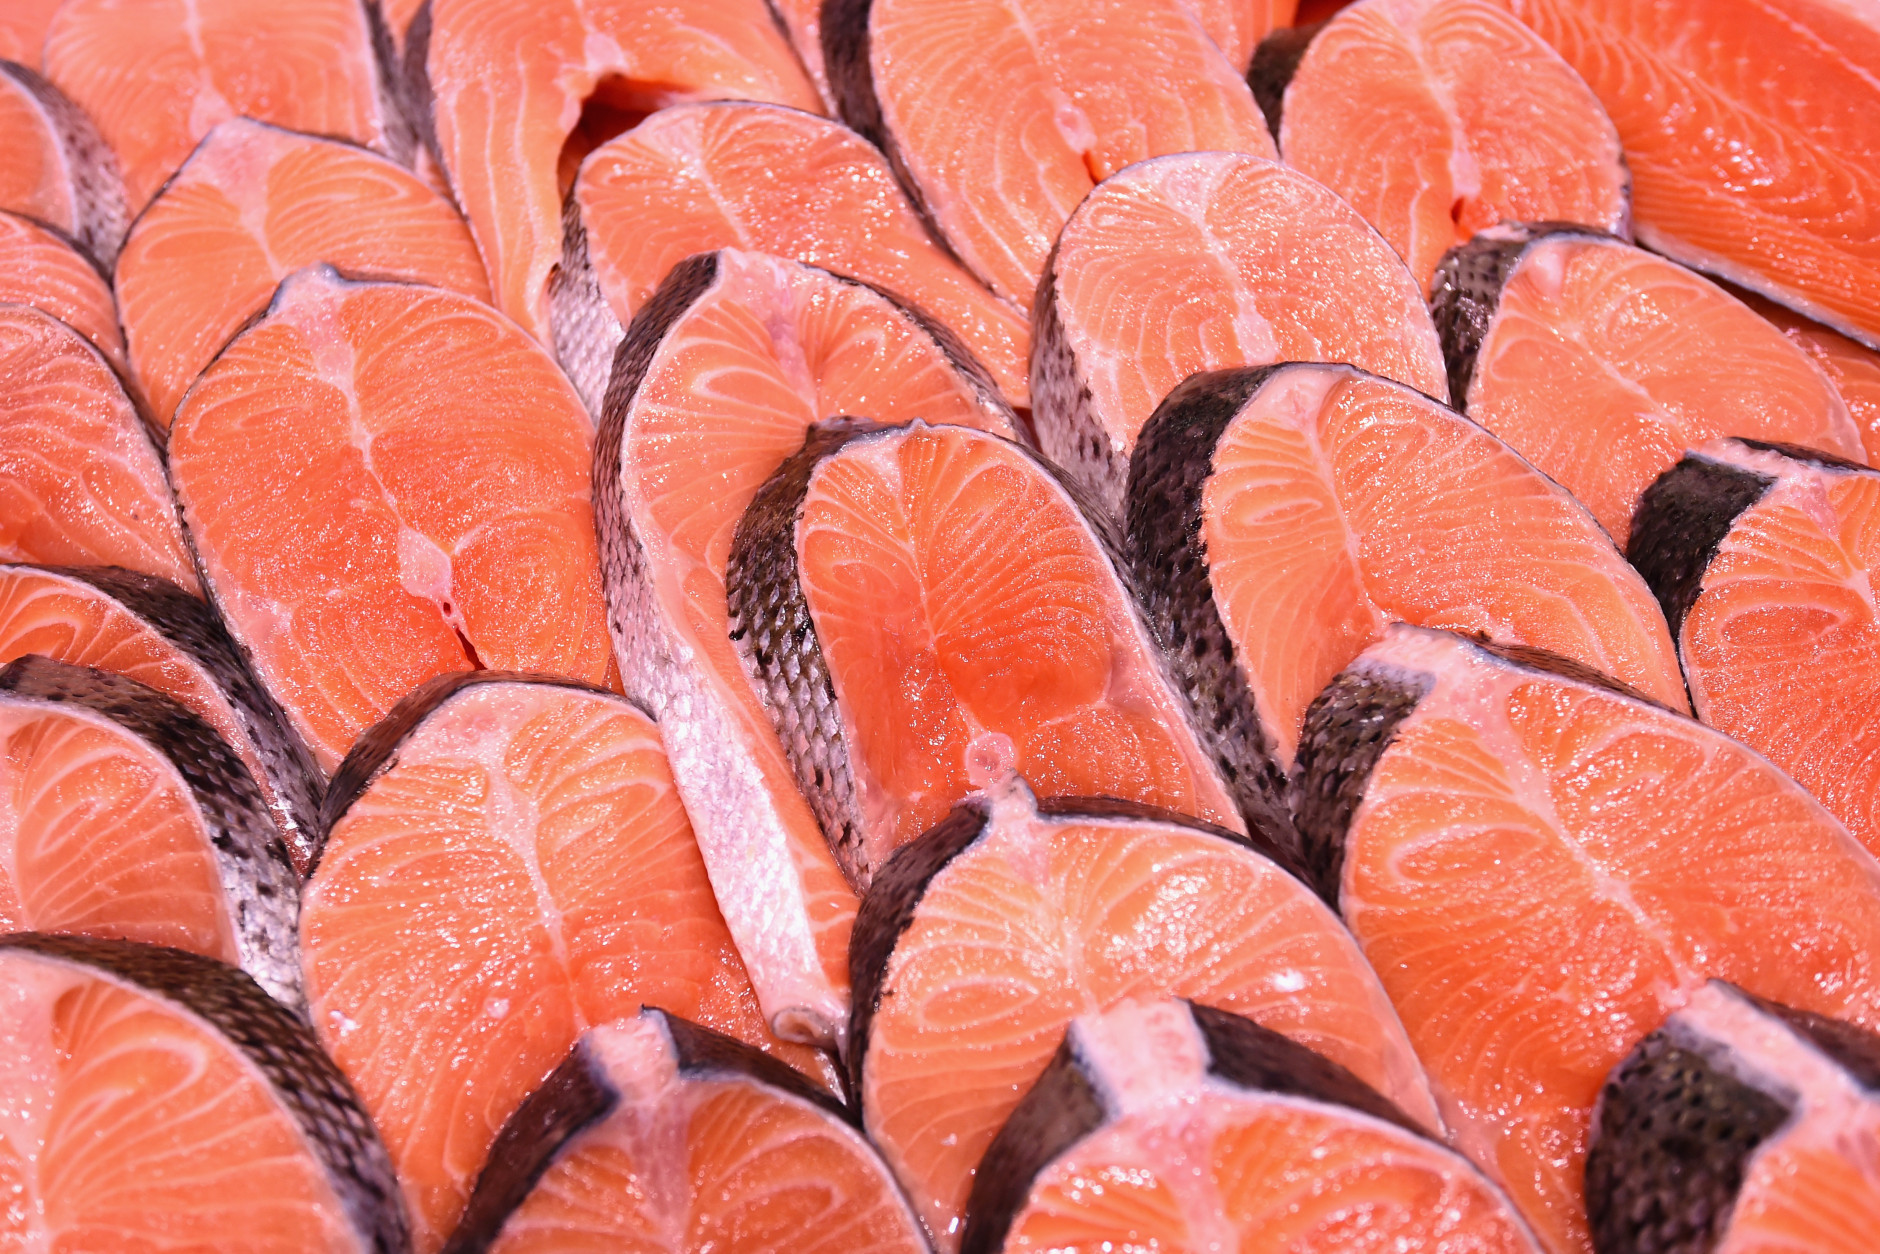 Rows of salmon steaks